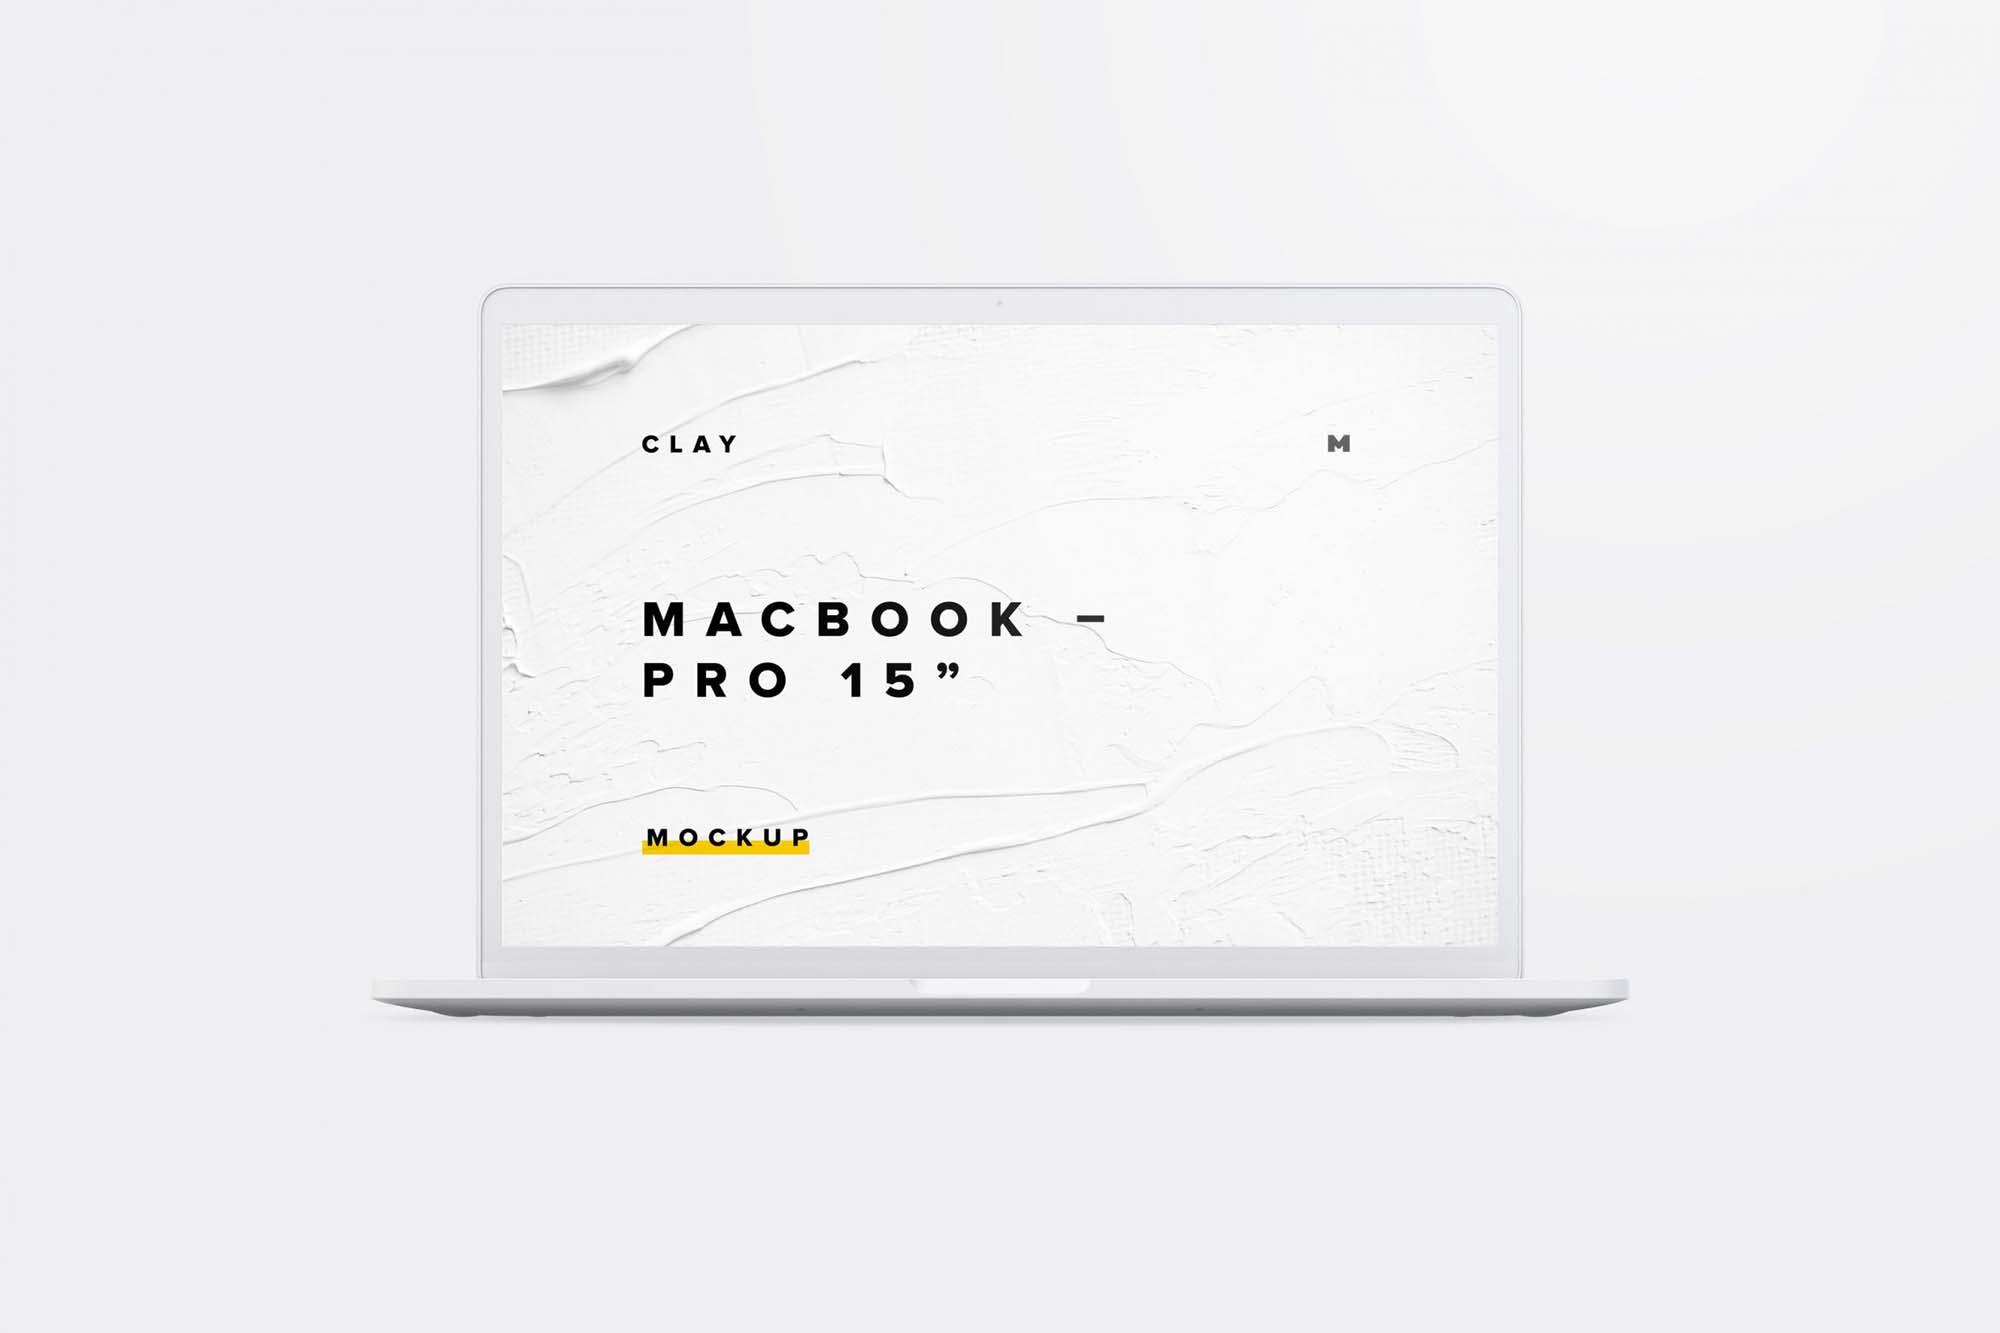 Clay Mackbook Pro